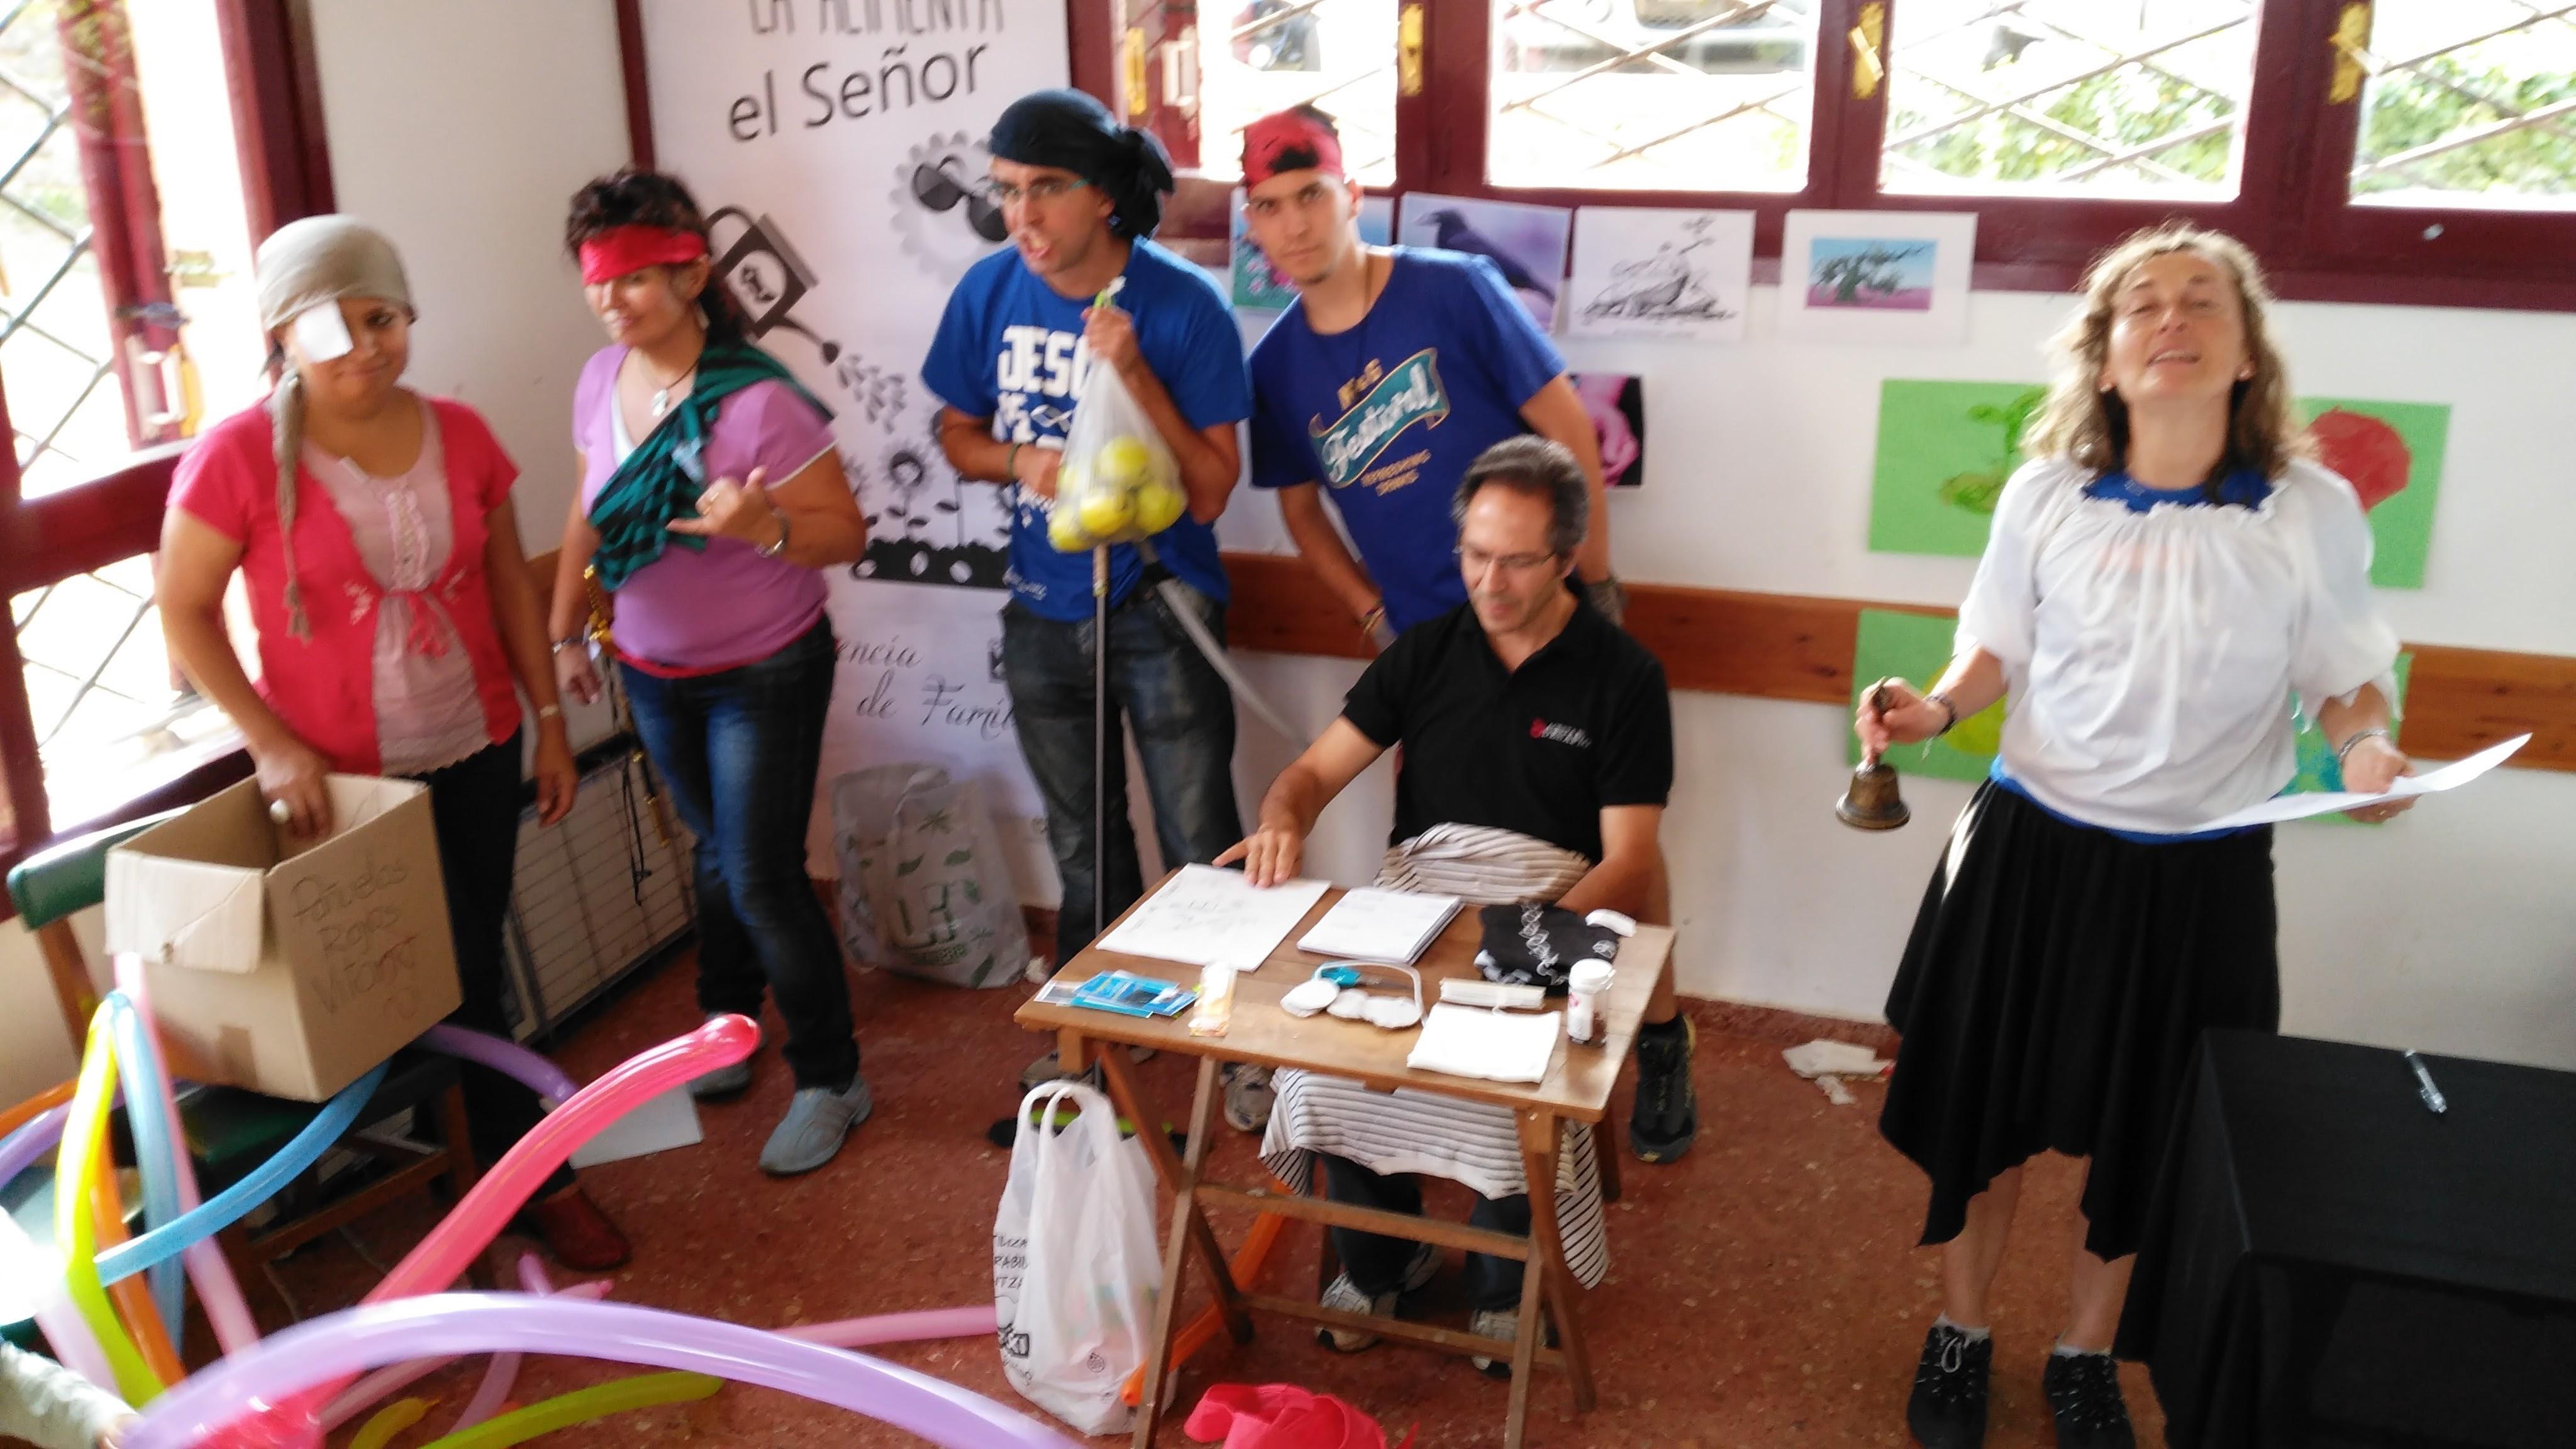 Picasa - 2015.09.12-13 - Convivencia Sector Familias(7).jpg